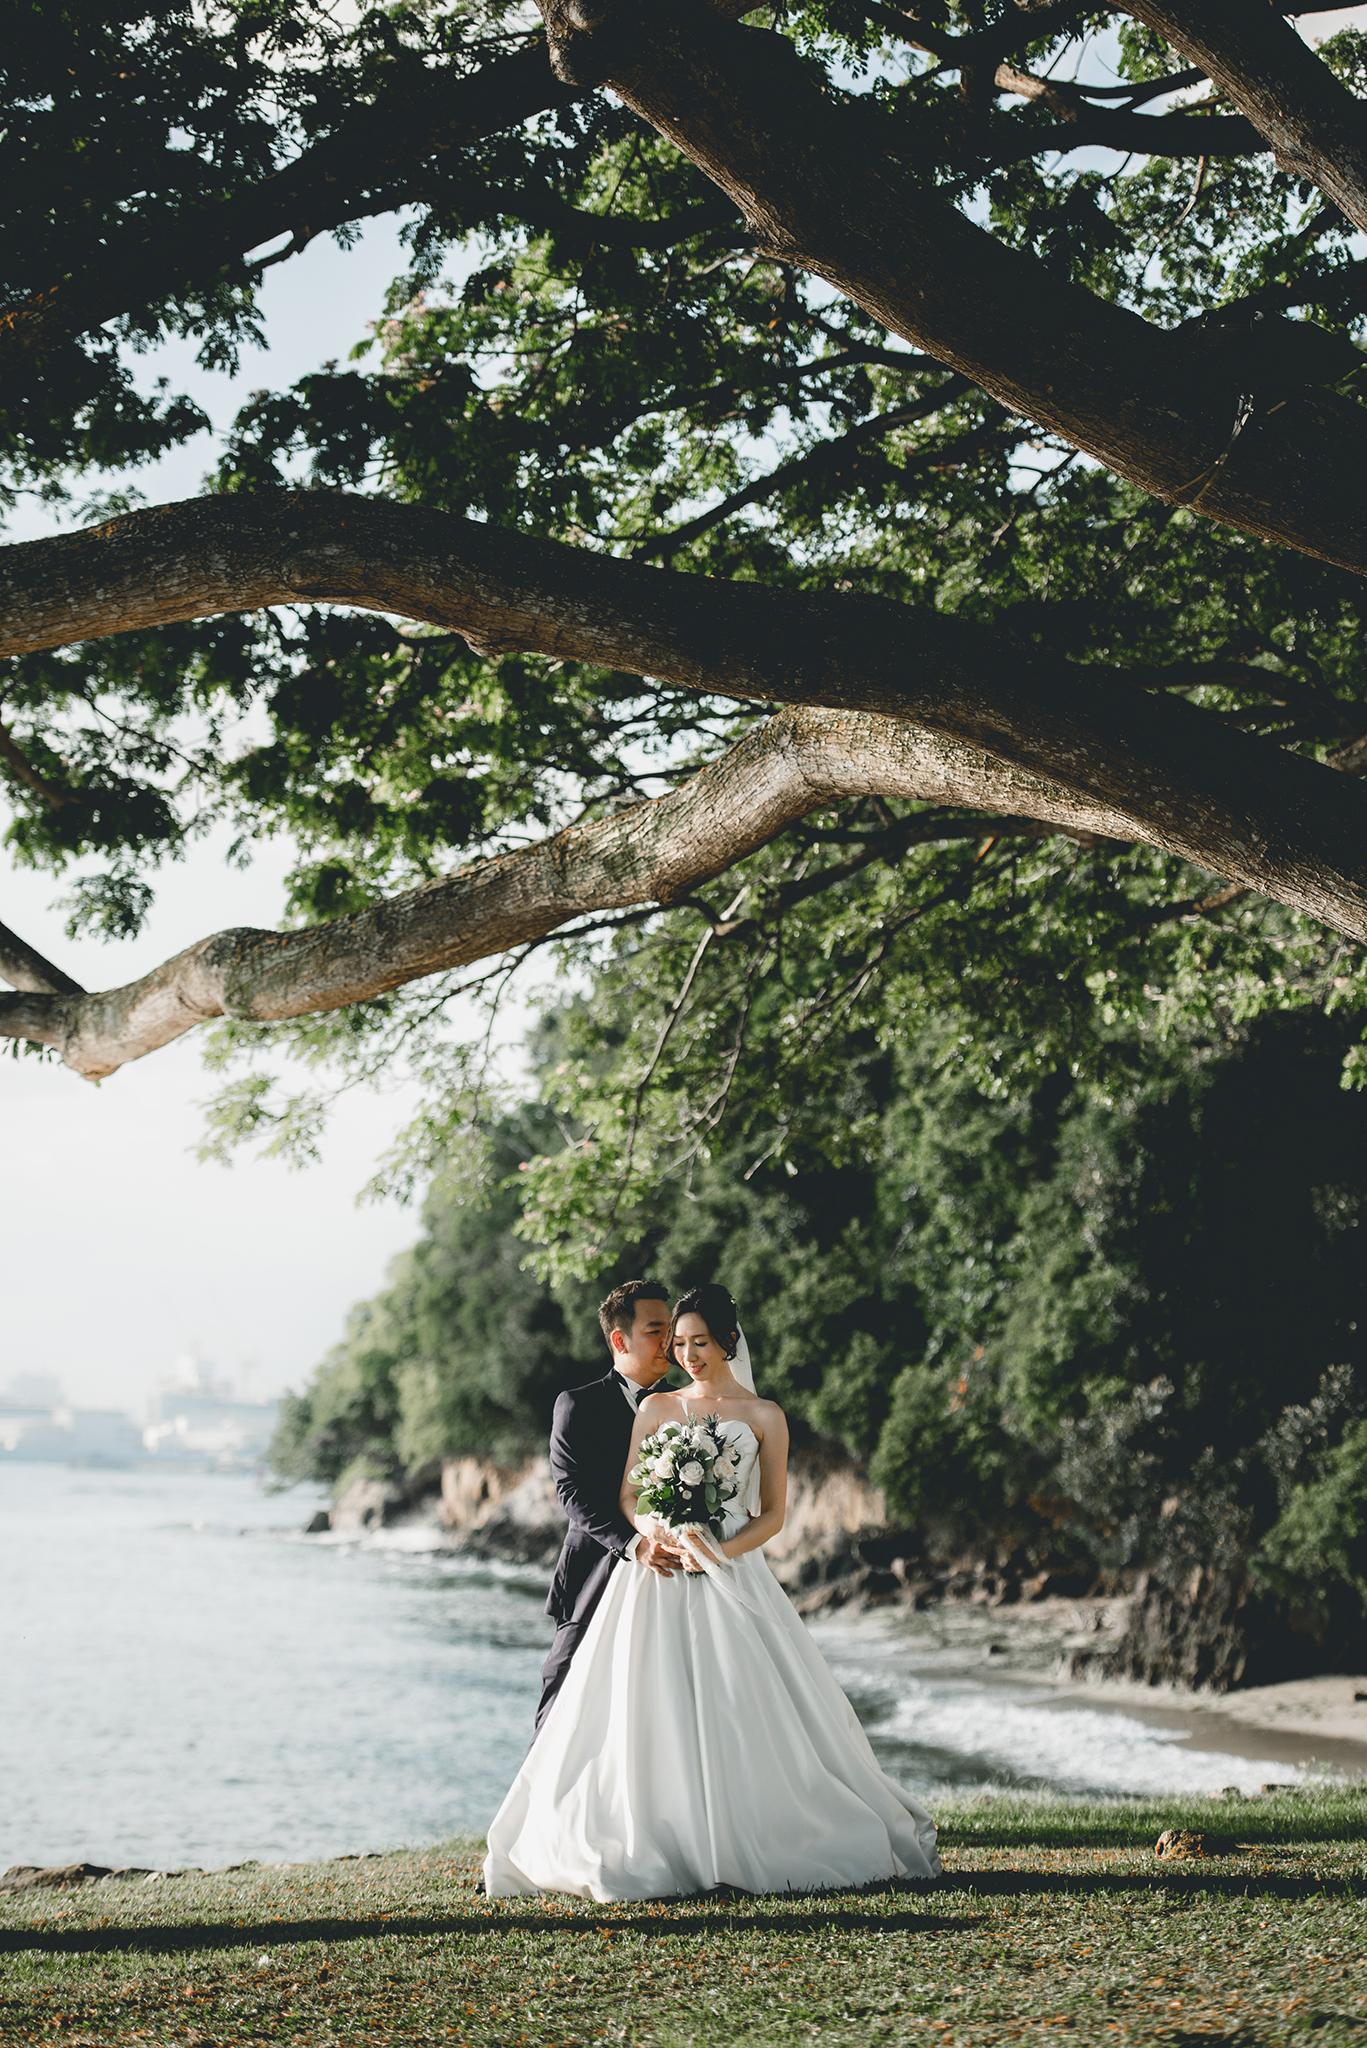 Pre wedding Sentosa 00027.JPG